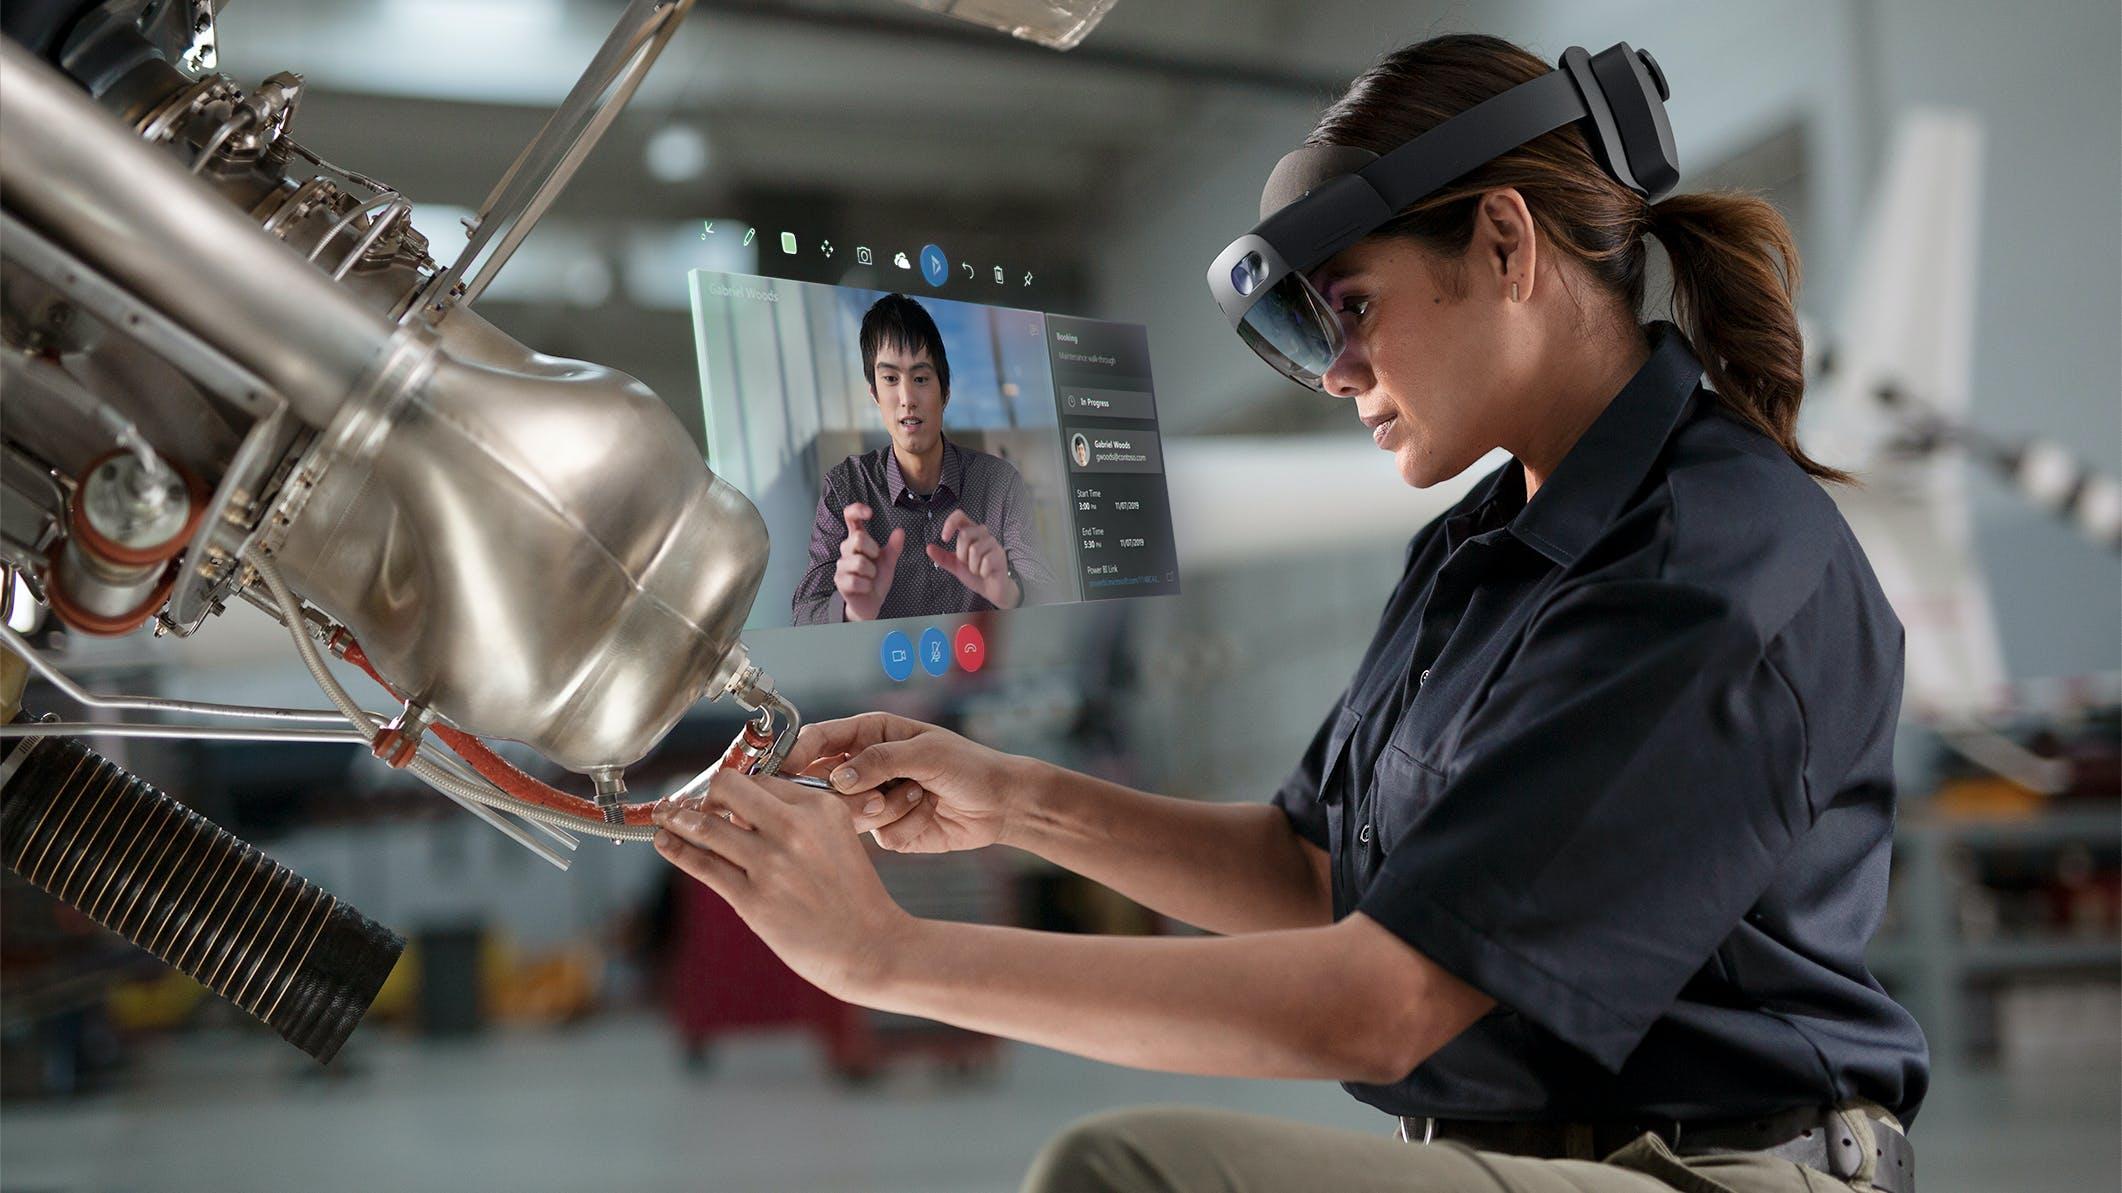 Titelbild-Microsoft-Hololens-Holo-Lens-2-Remote-Assist-Woman-c-Microsoft